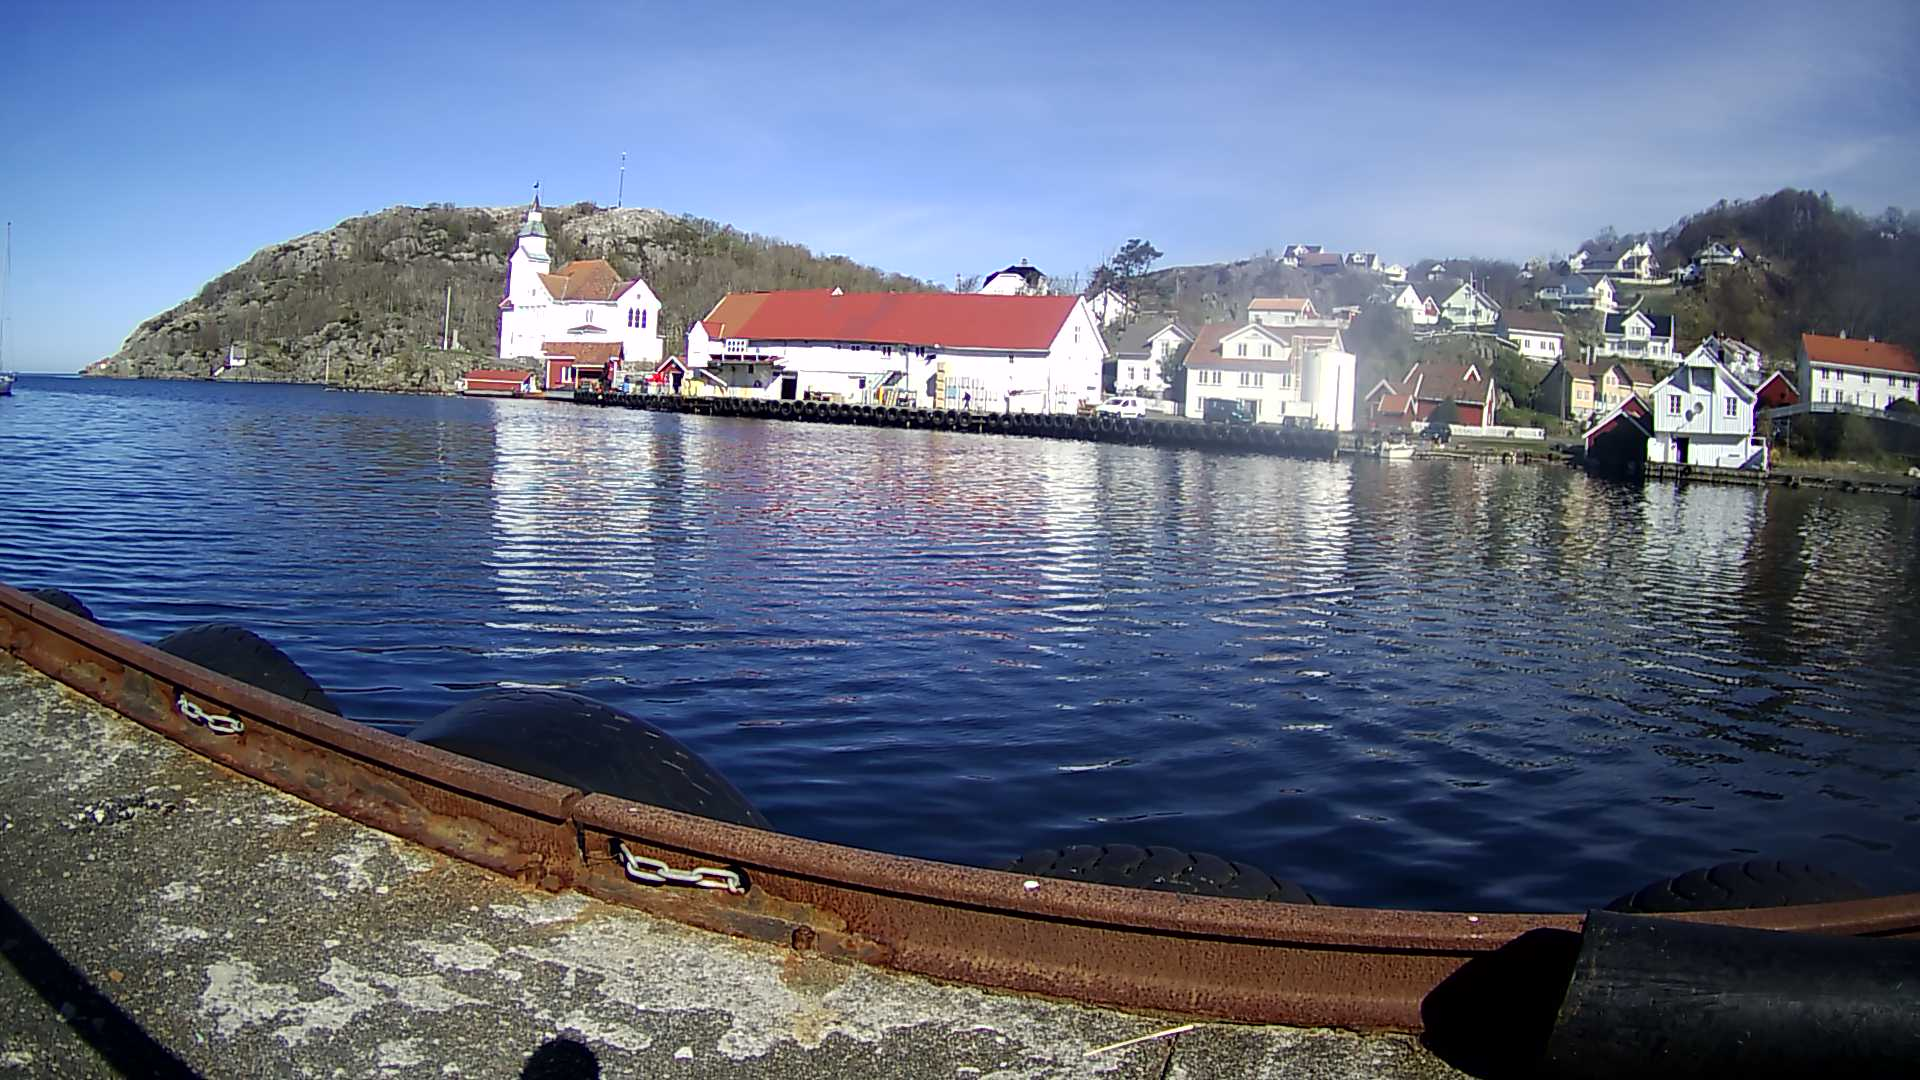 Webcam Kirkehavn, Flekkefjord, Vest-Agder, Norwegen